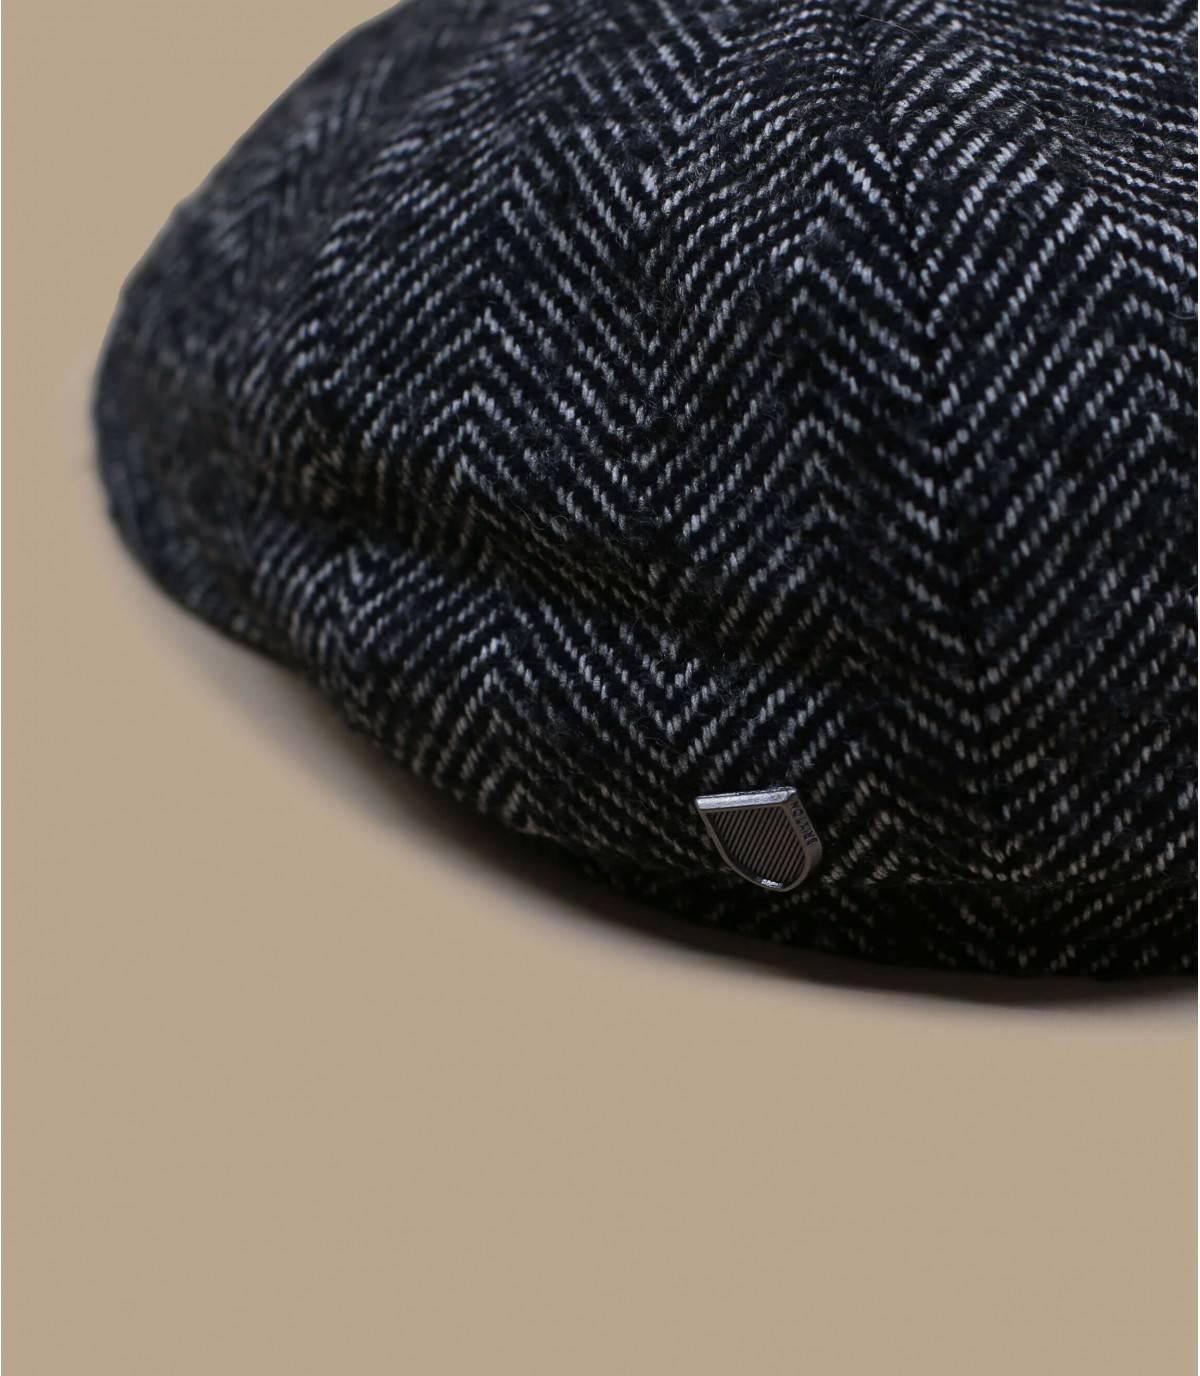 gorra repartidor gris jaspeado